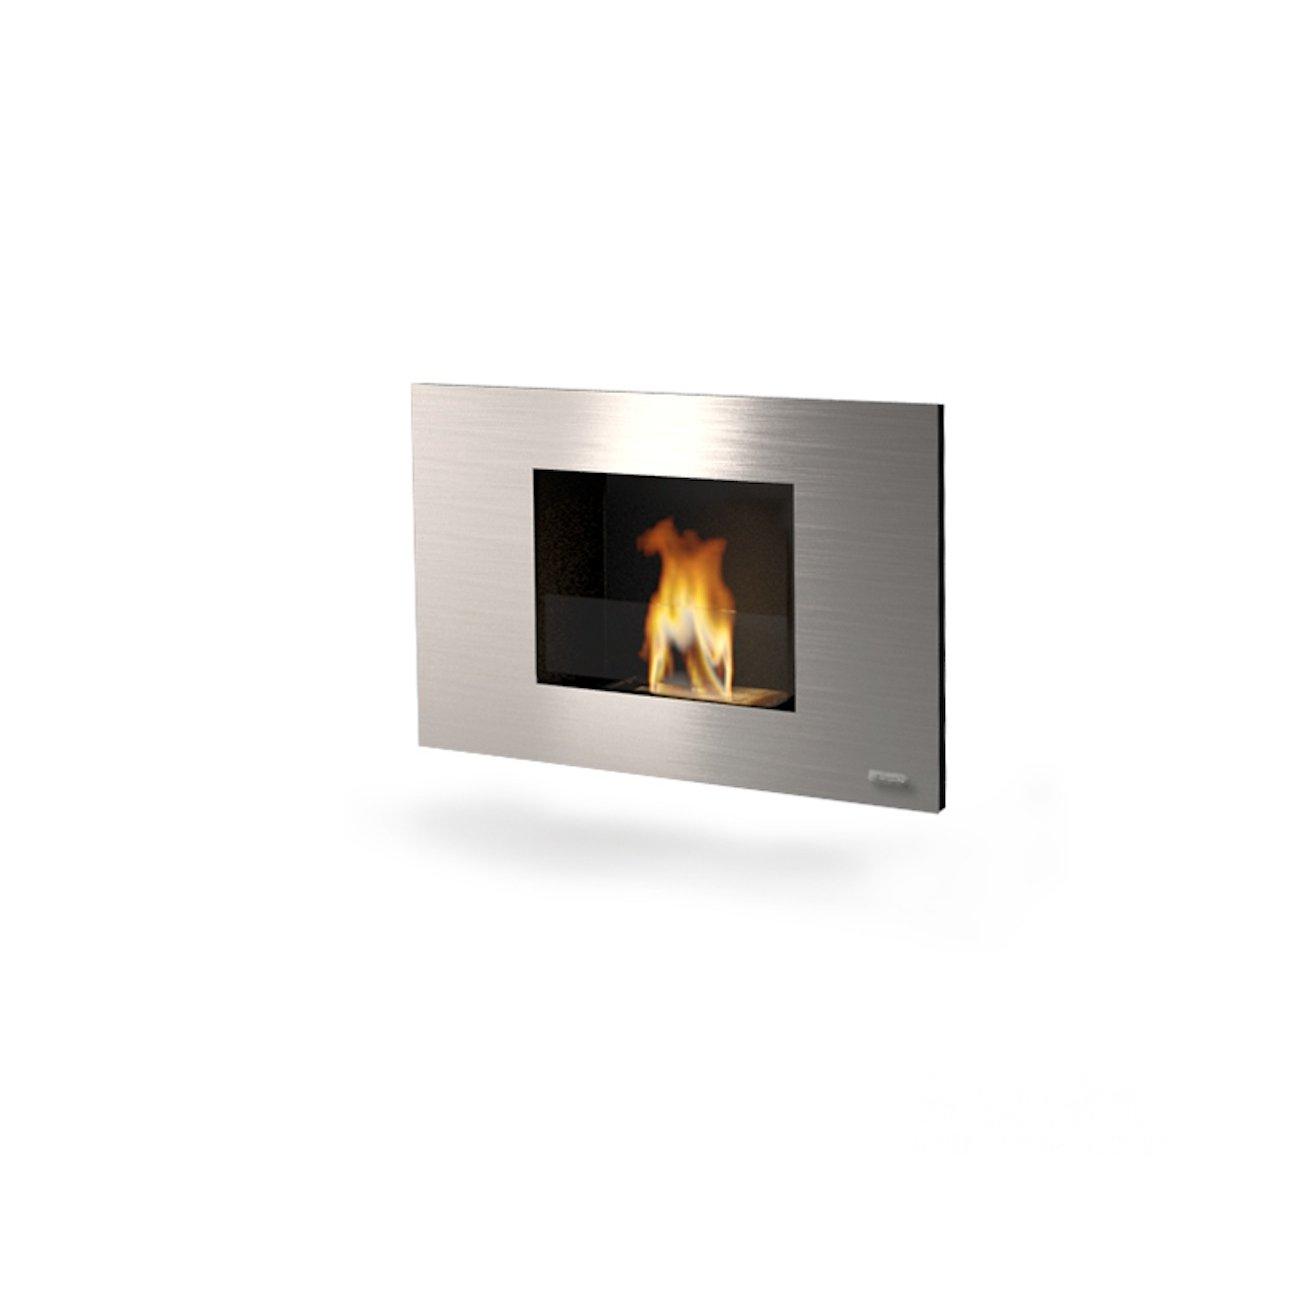 glammfire zen ethanol wandkamin. Black Bedroom Furniture Sets. Home Design Ideas